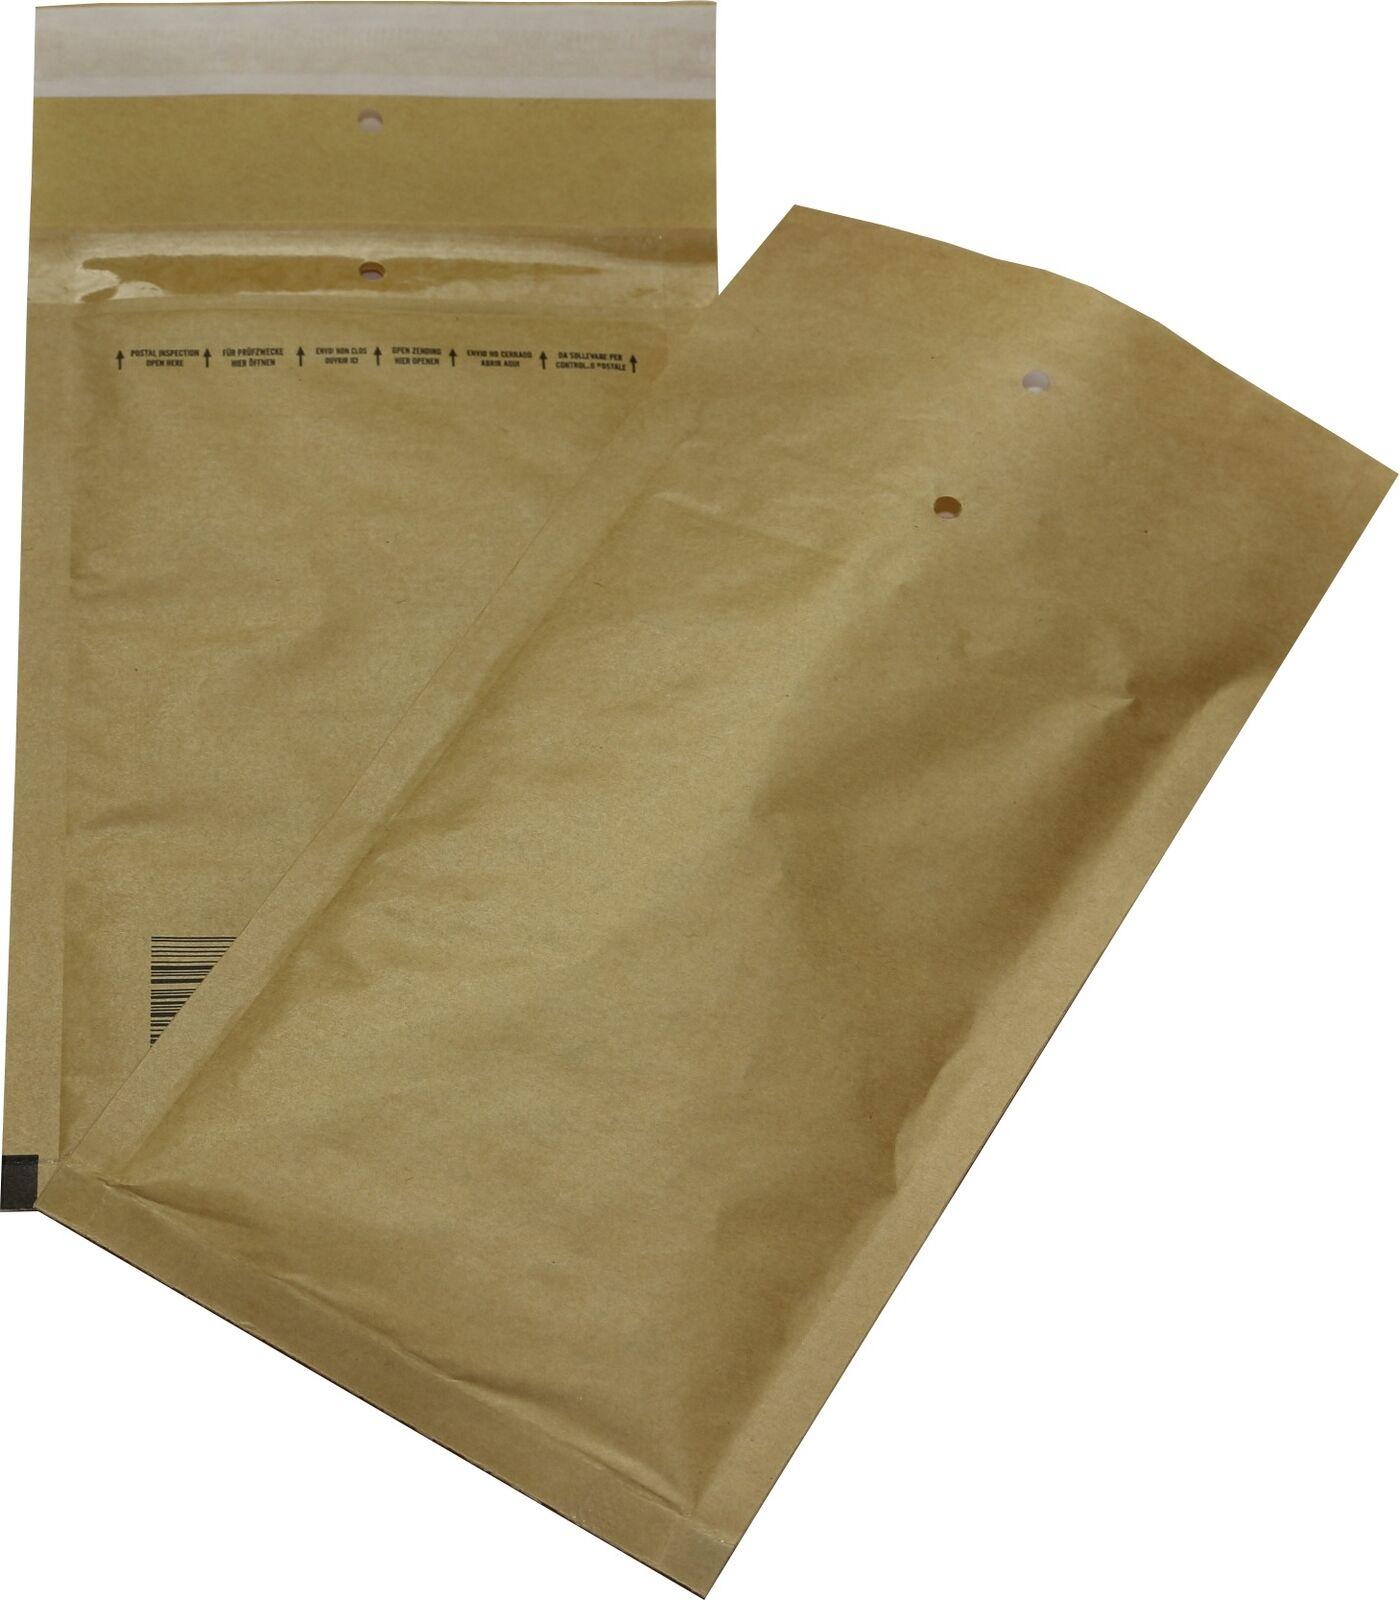 1800 ST bulles d'air poches T 2 B Marron a6+ 140x225 Enveloppes DIN a6+ Marron c6 39f0c5